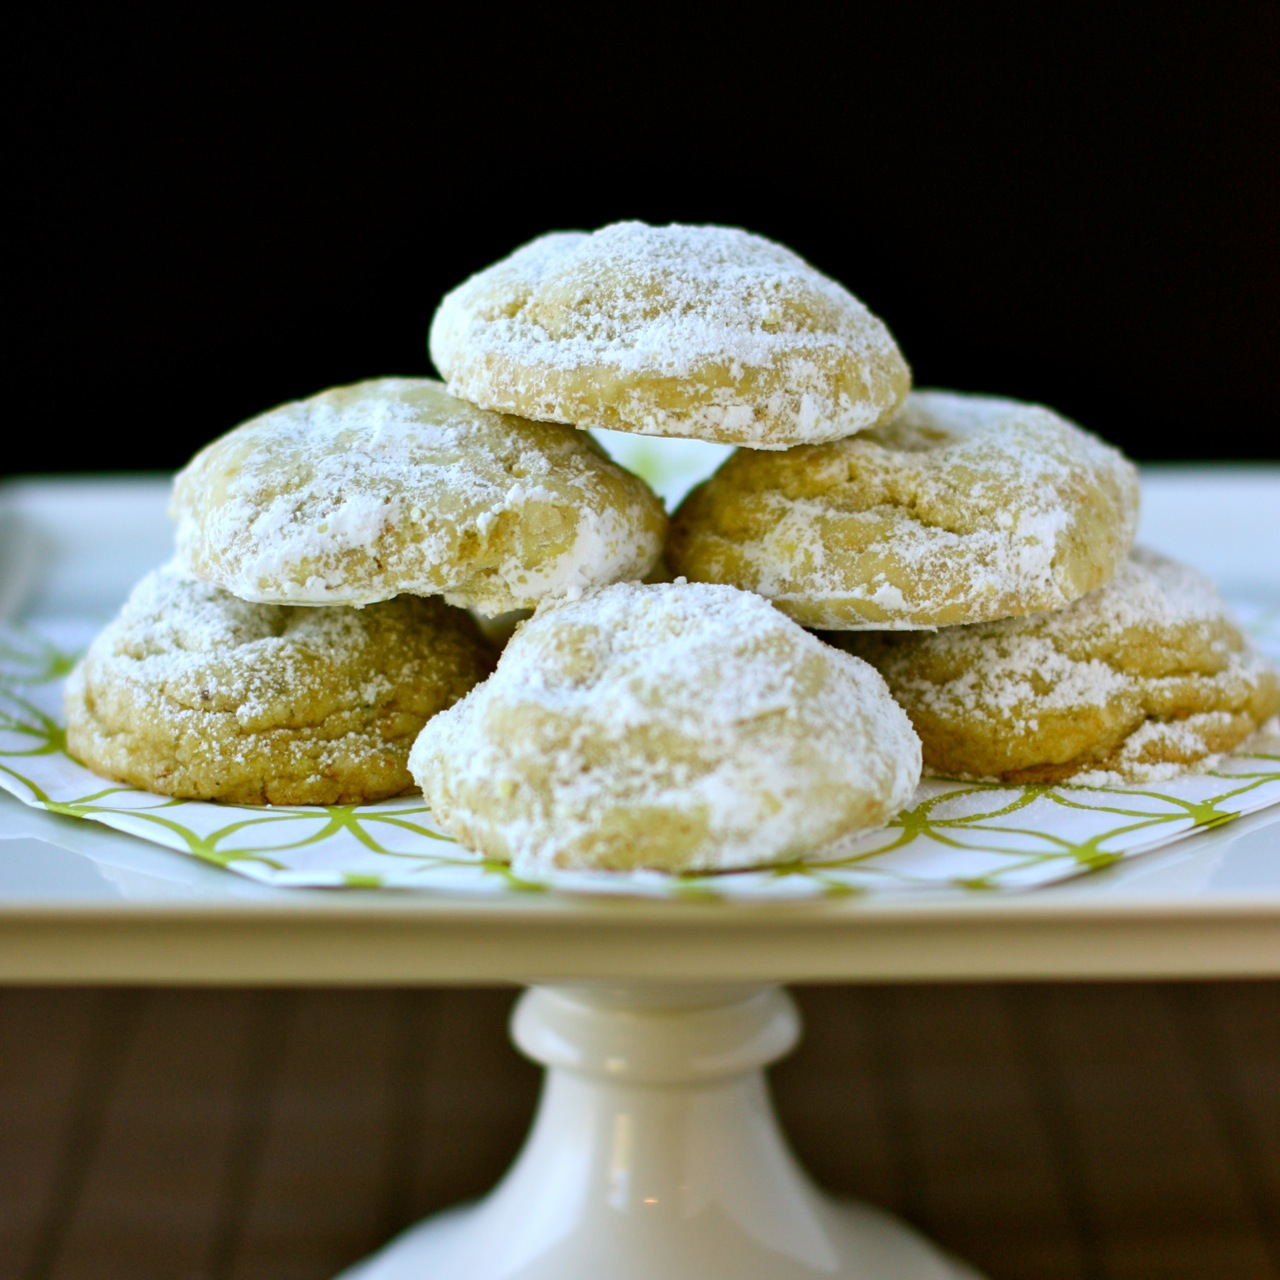 pistachio-lemon crinkle cookies | daisy's world